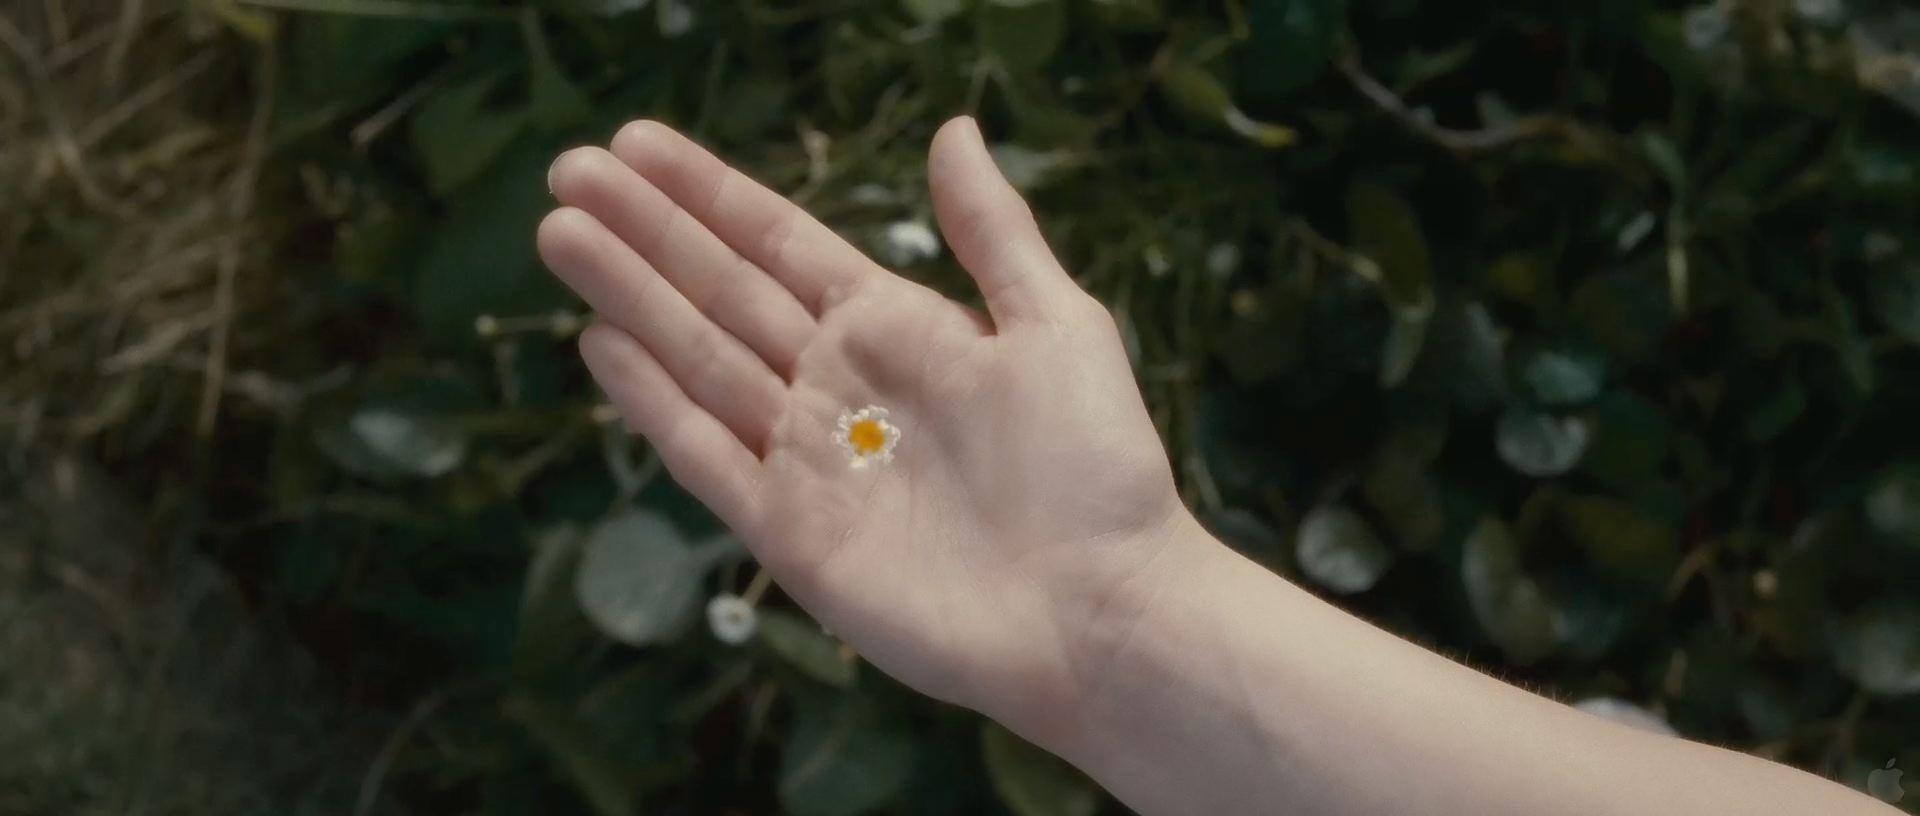 Harry Potter BlogHogwarts HP7 2 Trailer 04